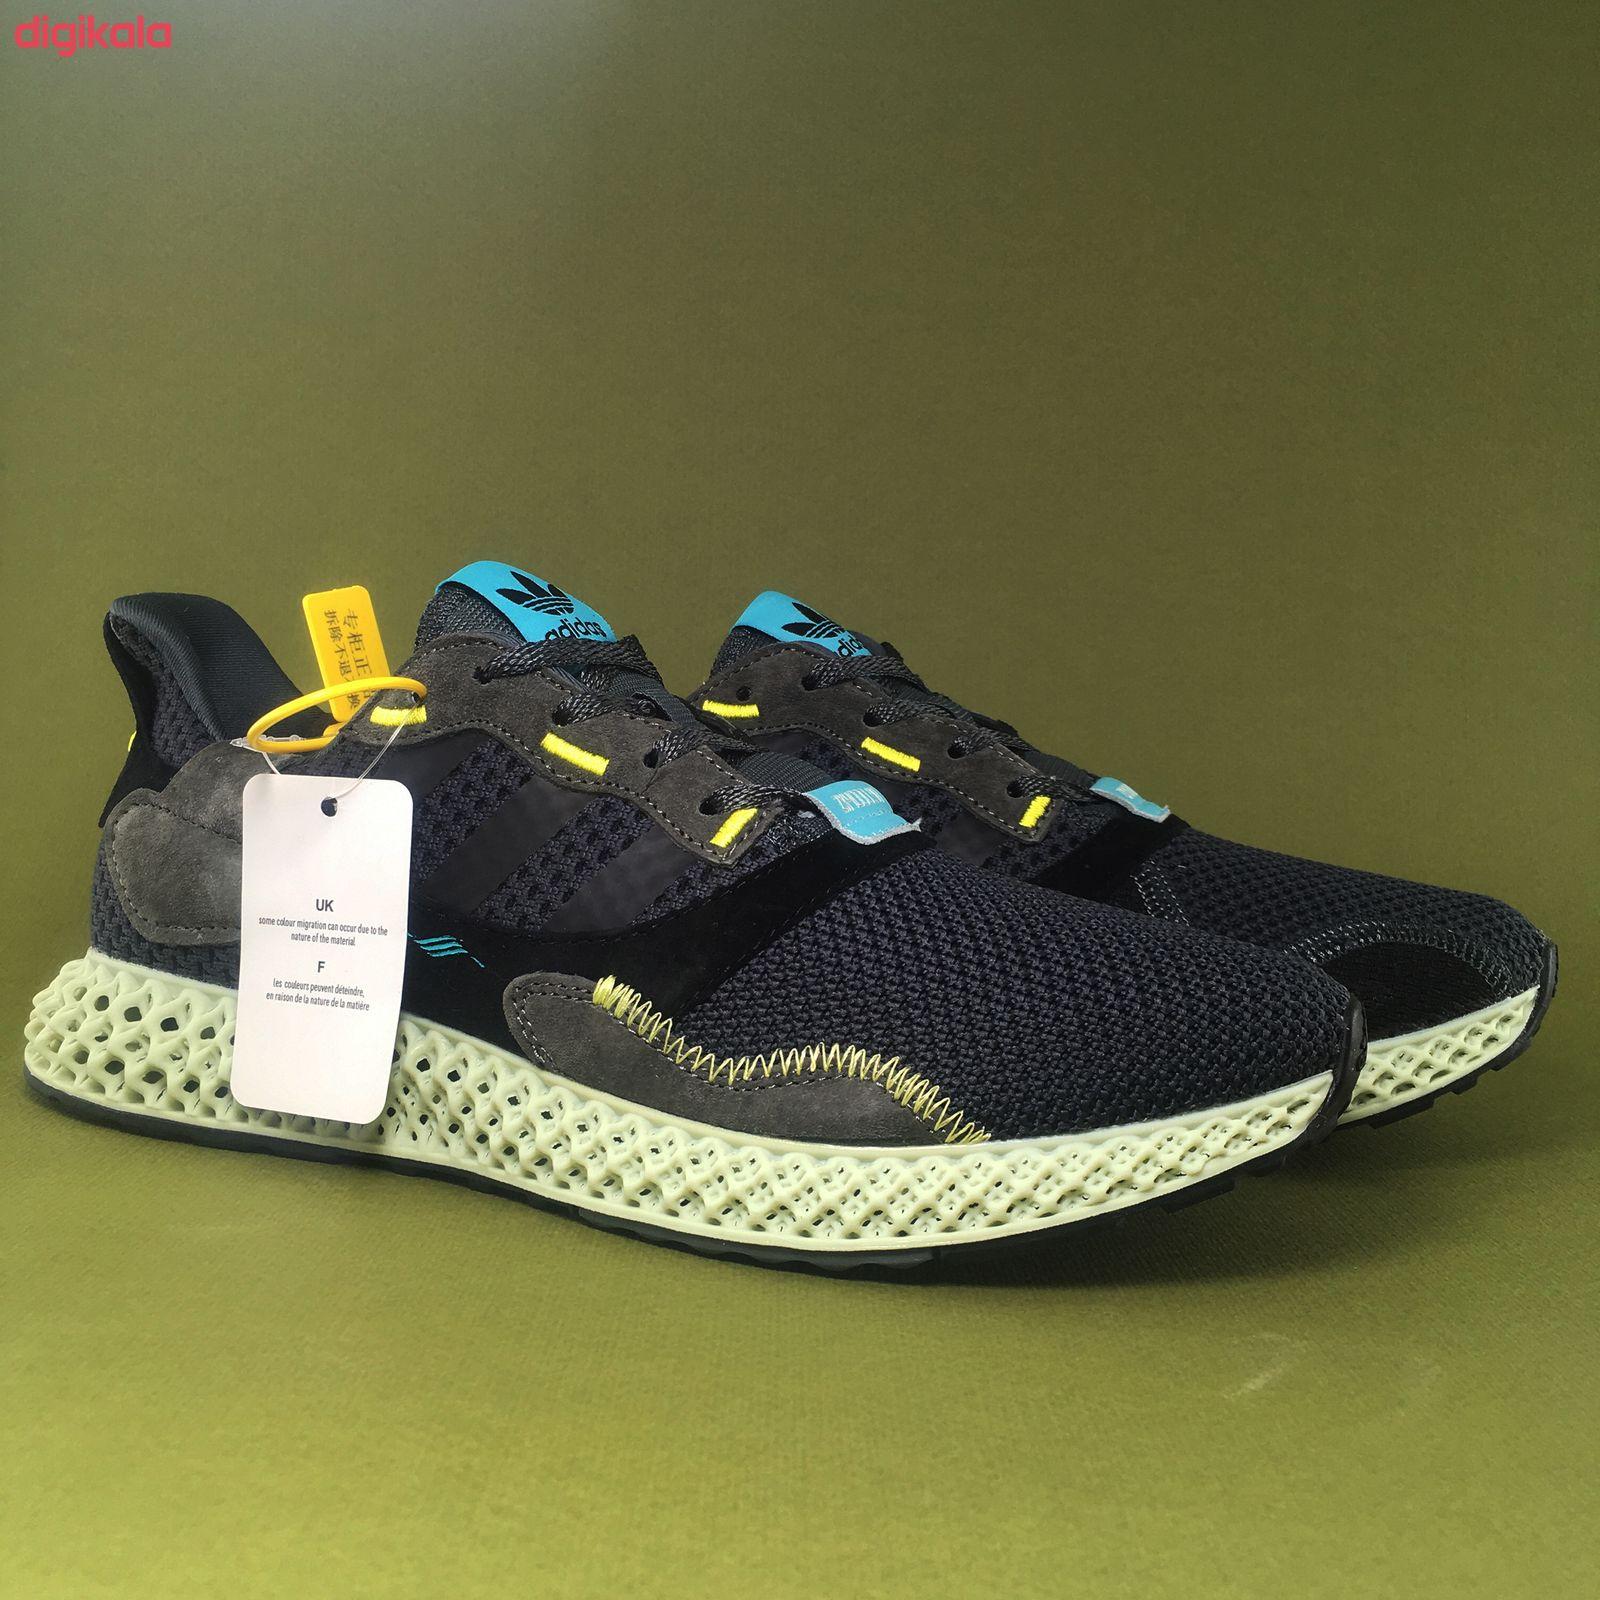 کفش مخصوص پیاده روی مردانه آدیداس مدل Zx4000 4D کد A83